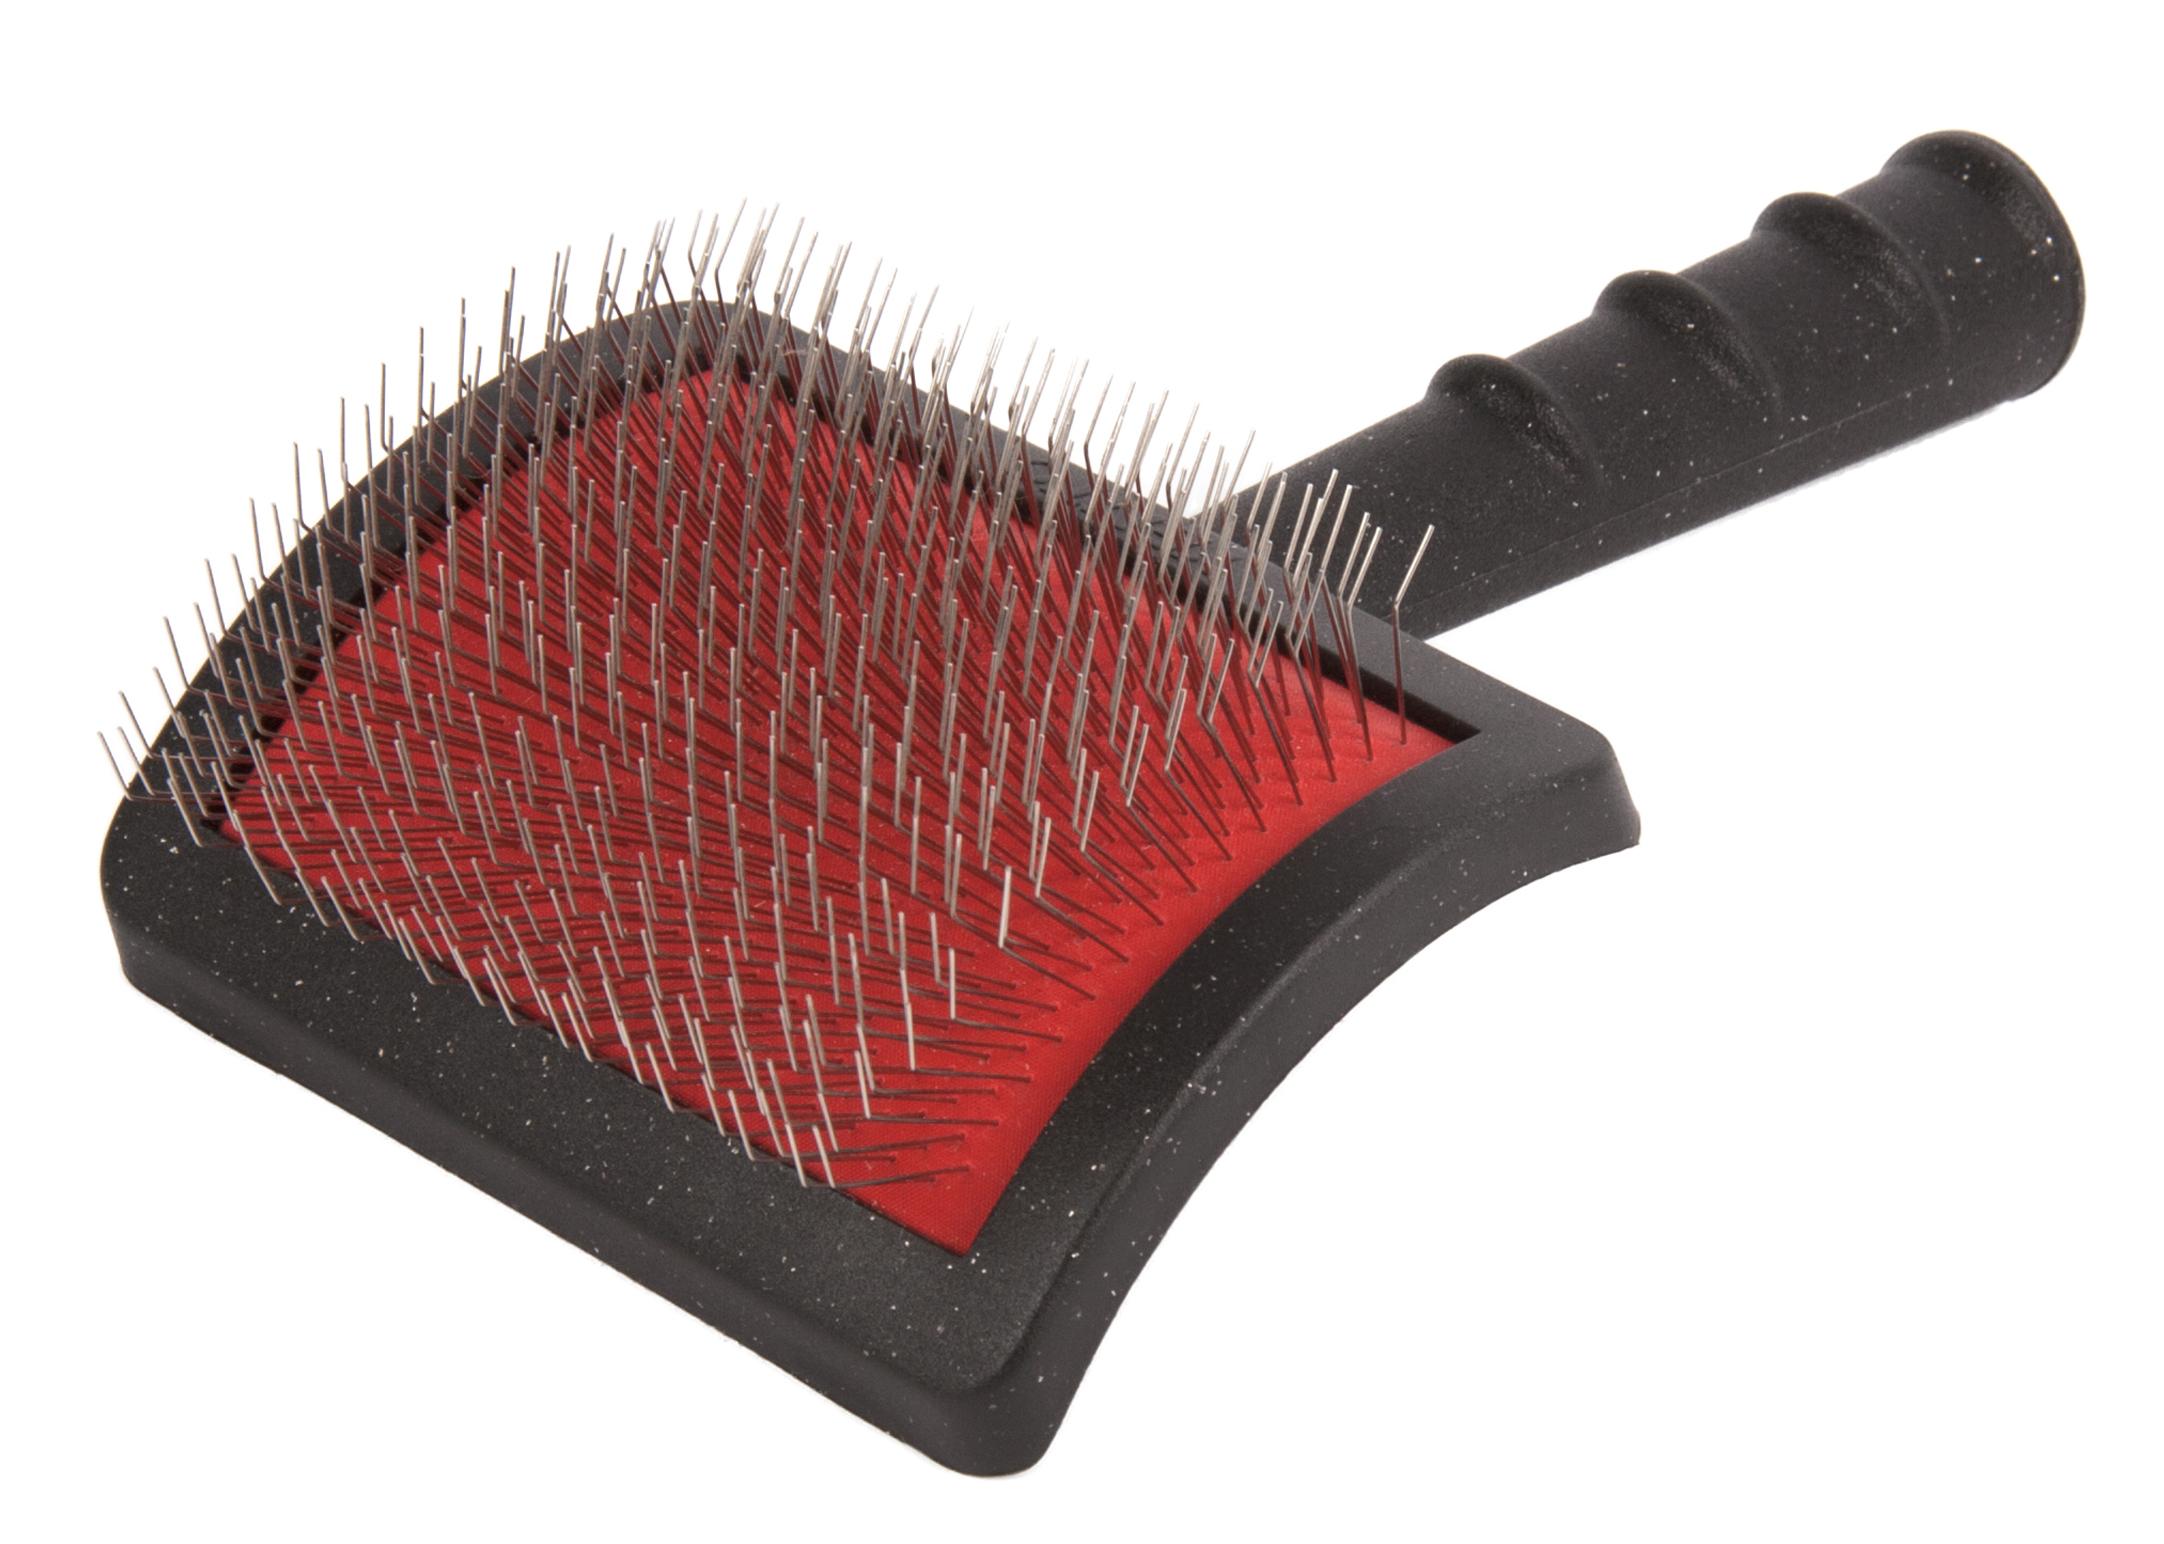 Yento Mega Pin Slicker Large Slicker Brush